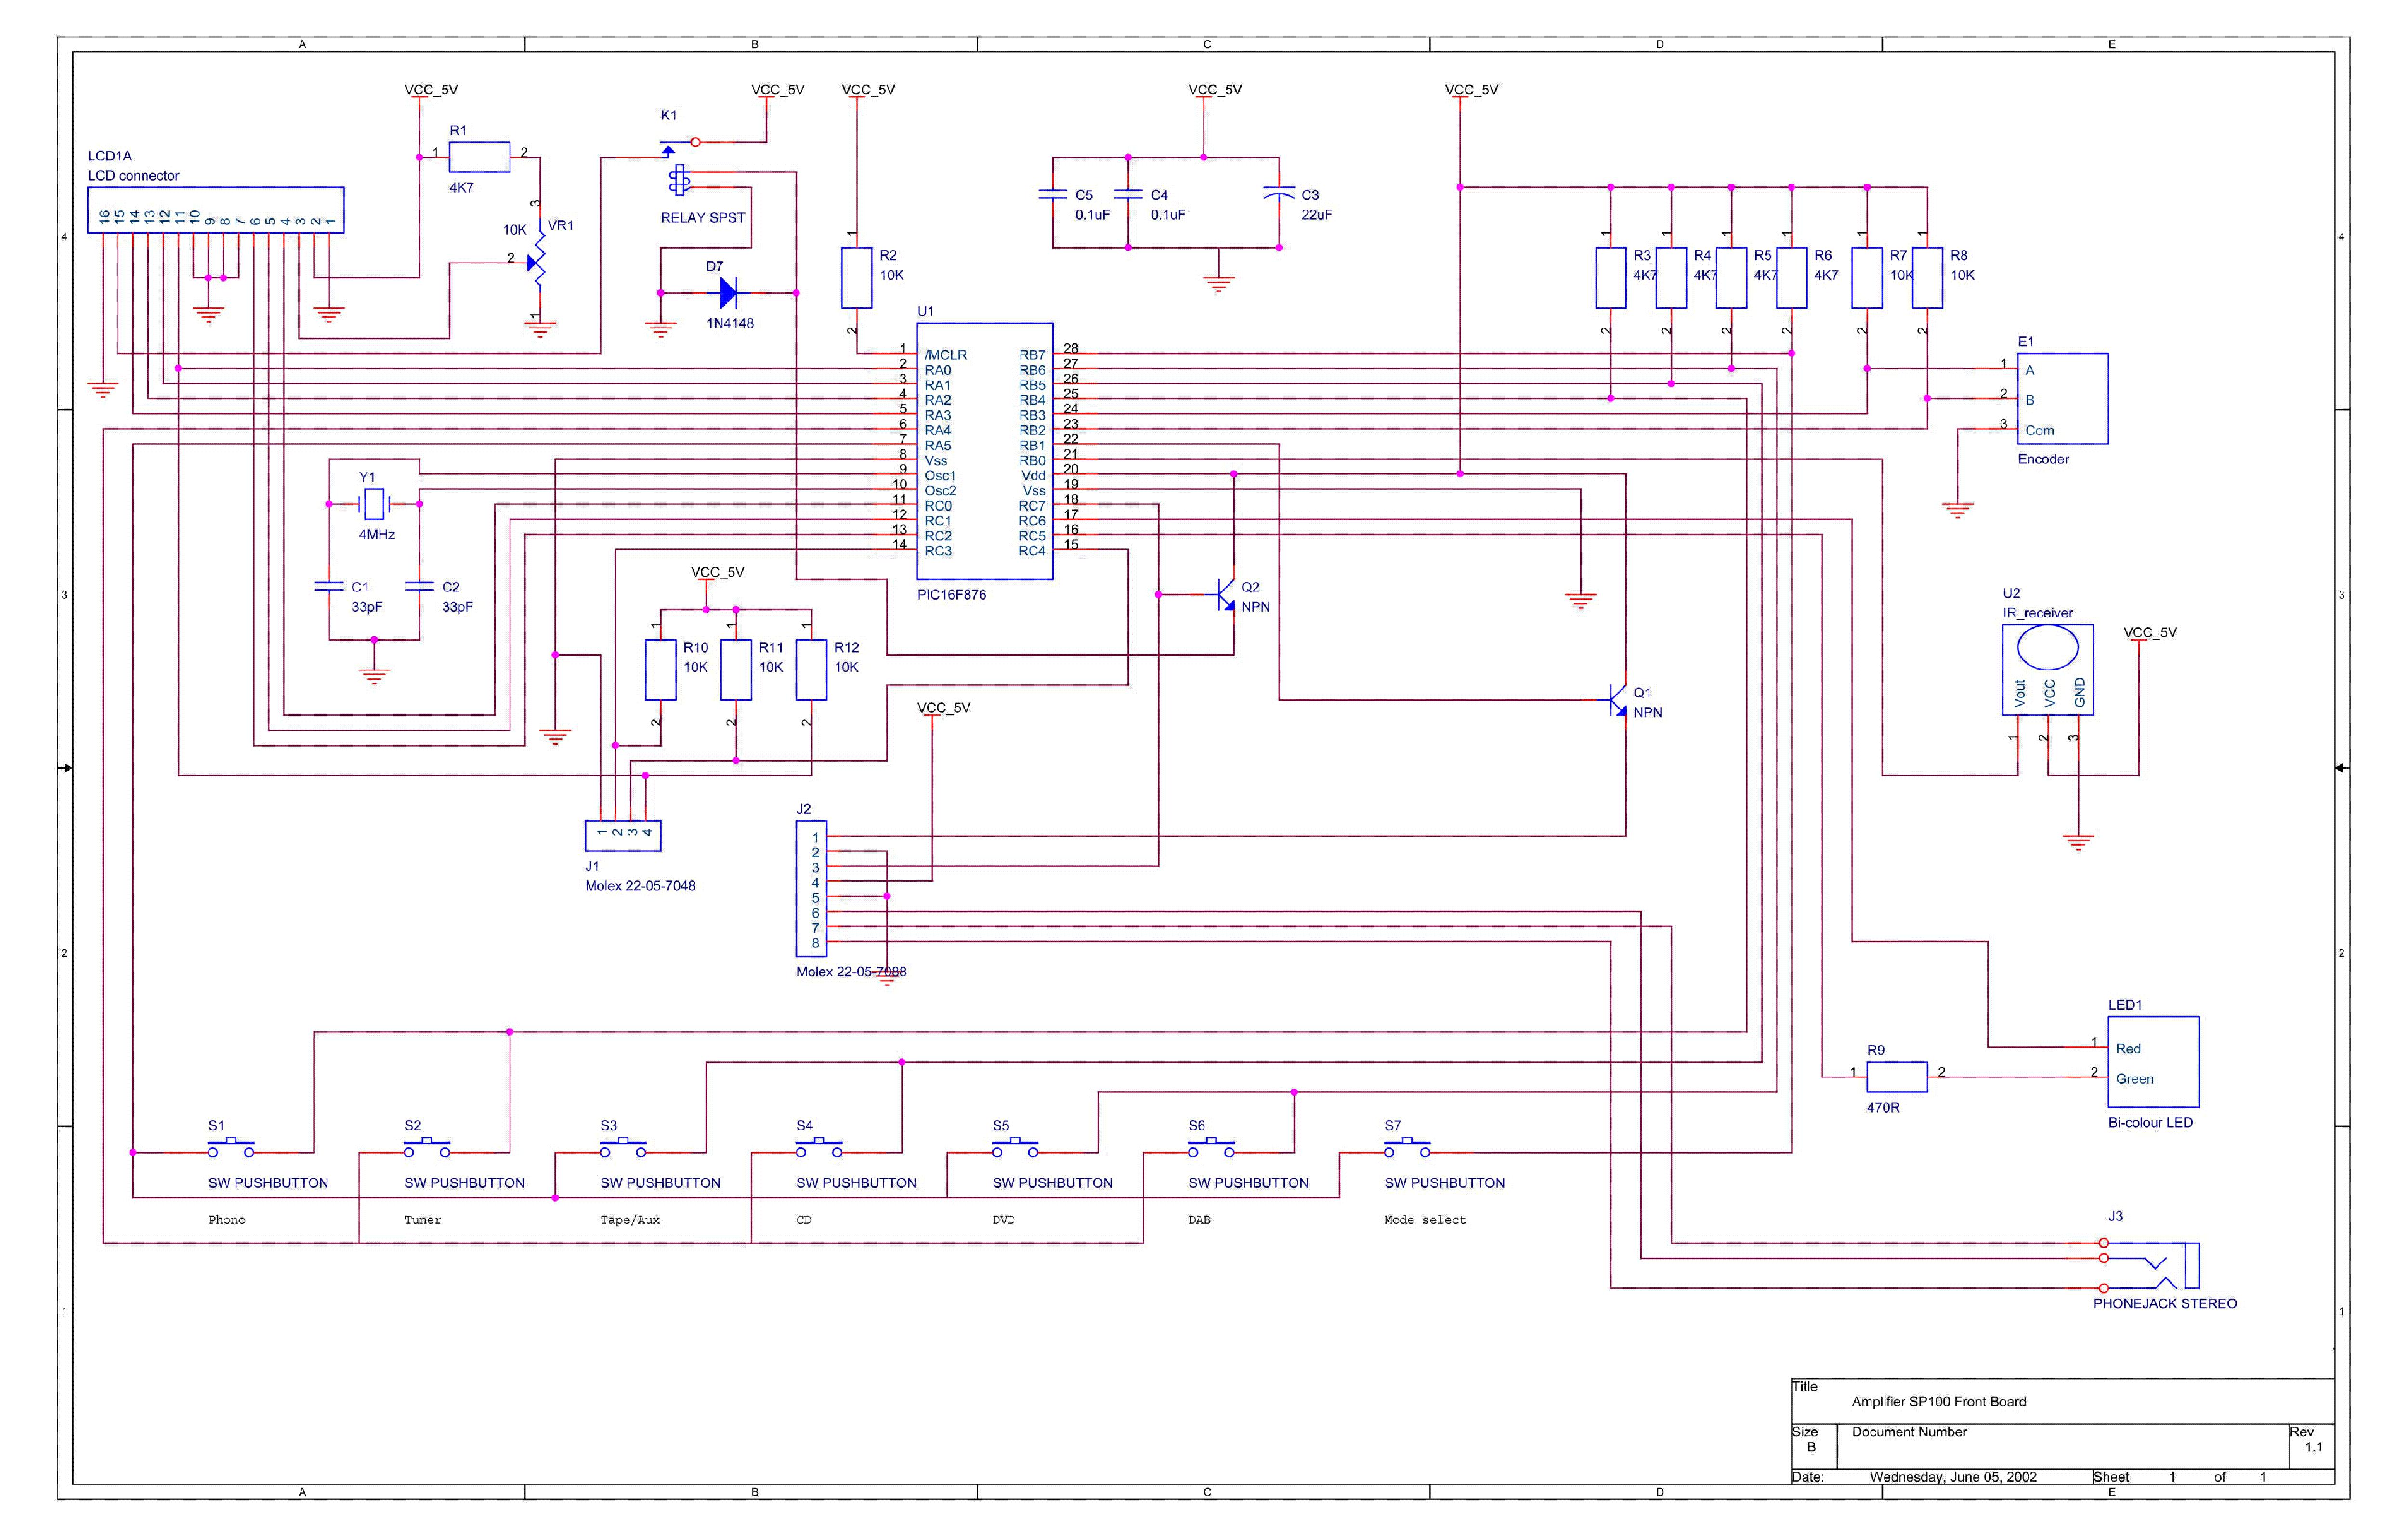 Odb2 Wiring Diagram Auto Electrical Cimar Guitar Copy Gibson Gro U00df Rco Schaltplan Zeitgen U00f6ssisch